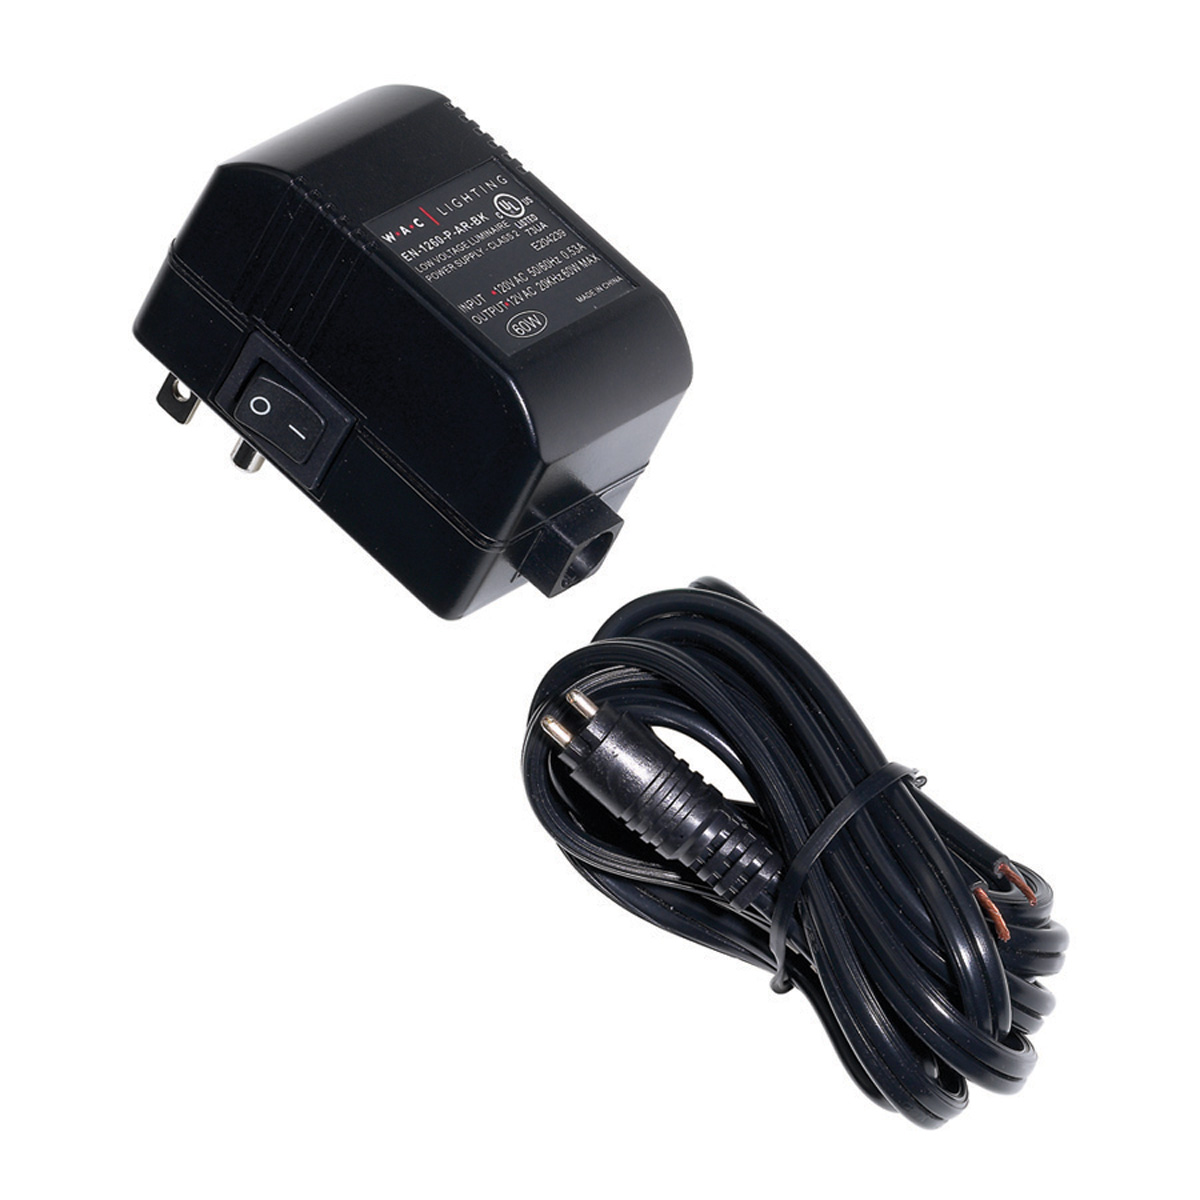 120v-24v-60w-plug-in-electronic-transformer